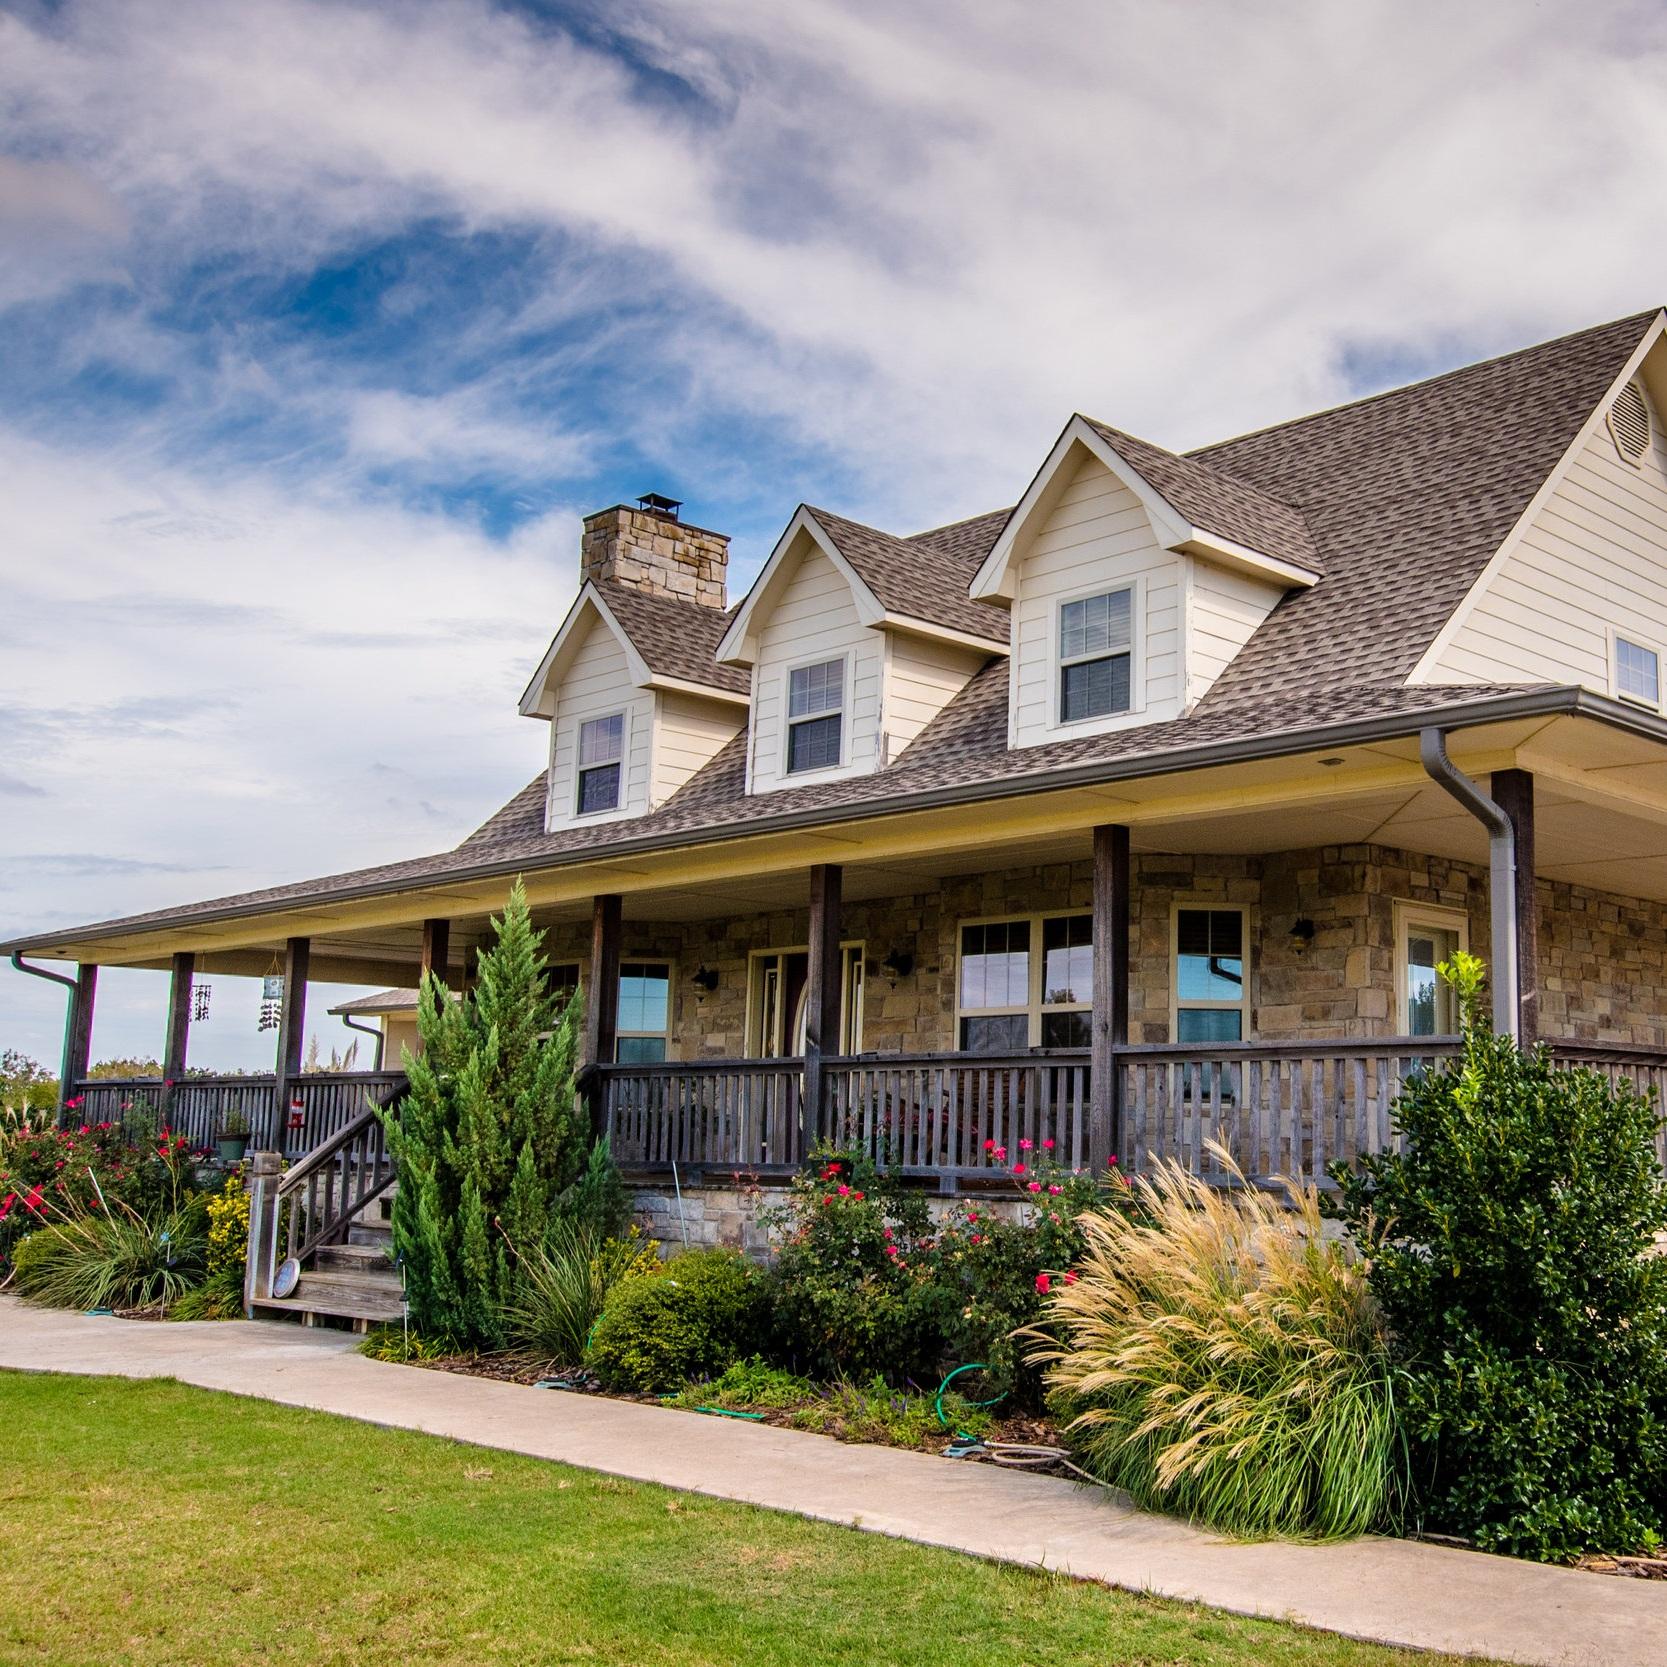 Real Estate: $150 - $75